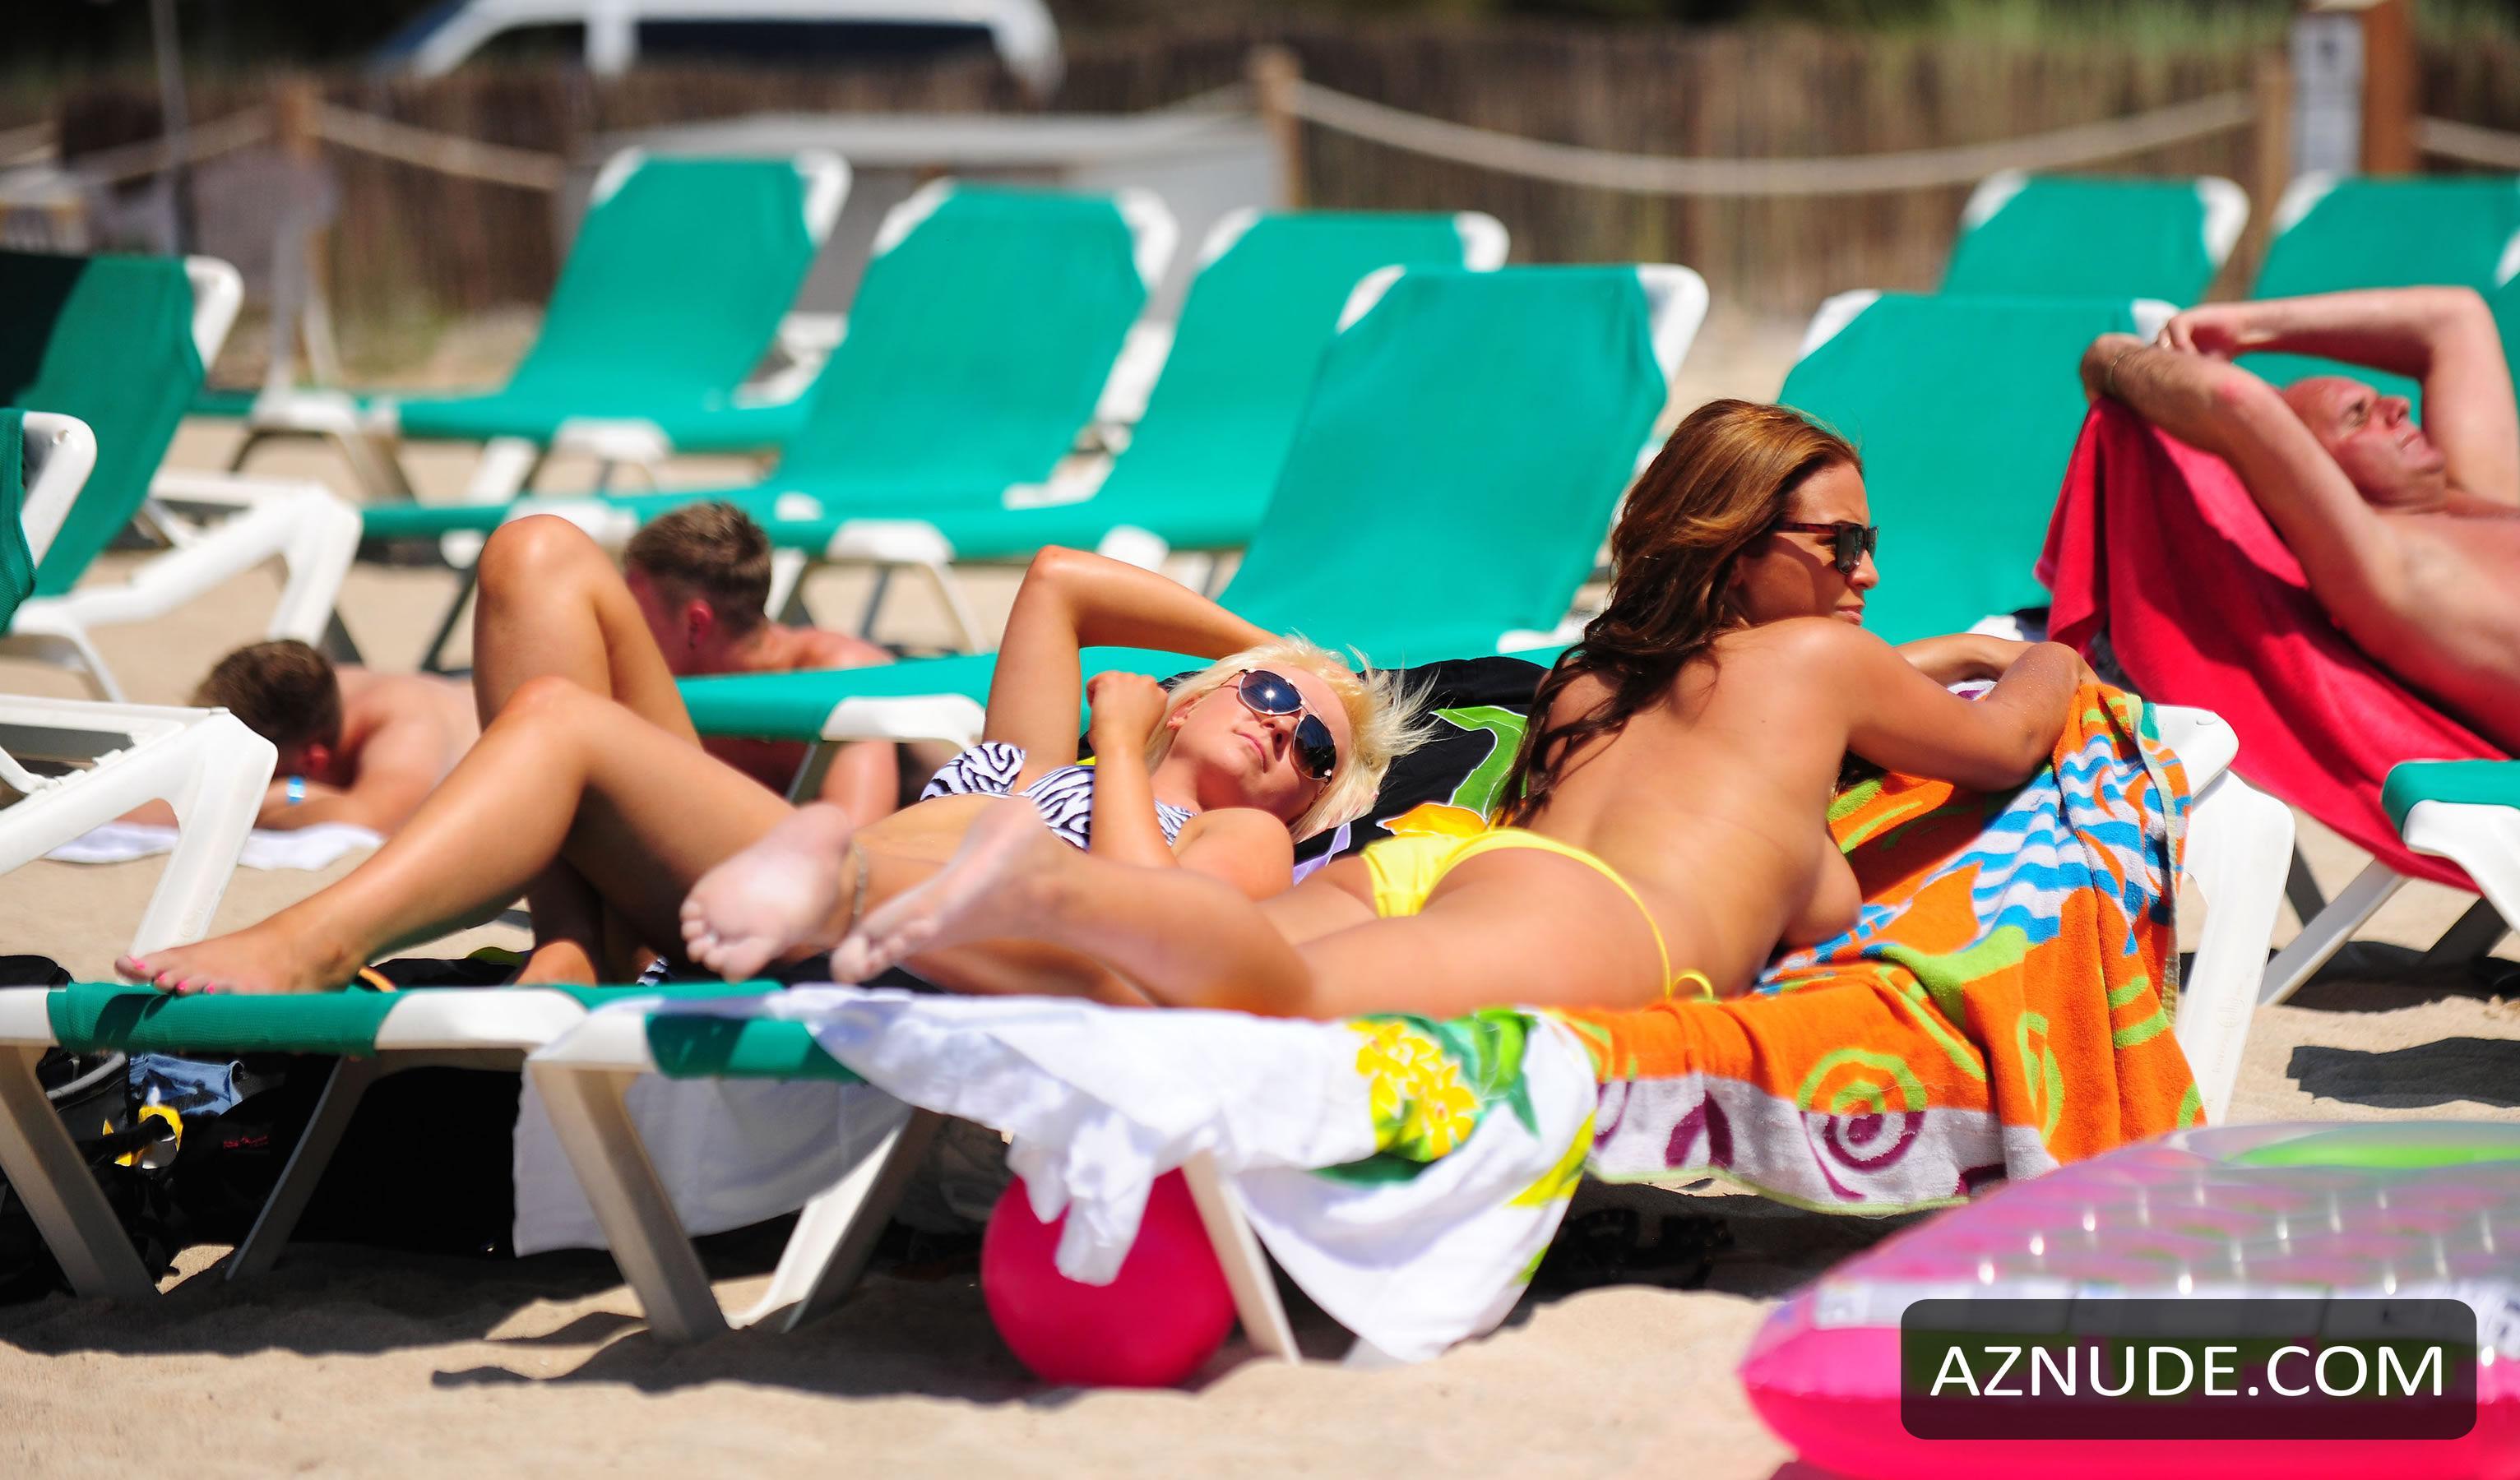 2019 Dominika Cibulkova nude (48 foto and video), Tits, Cleavage, Boobs, butt 2006